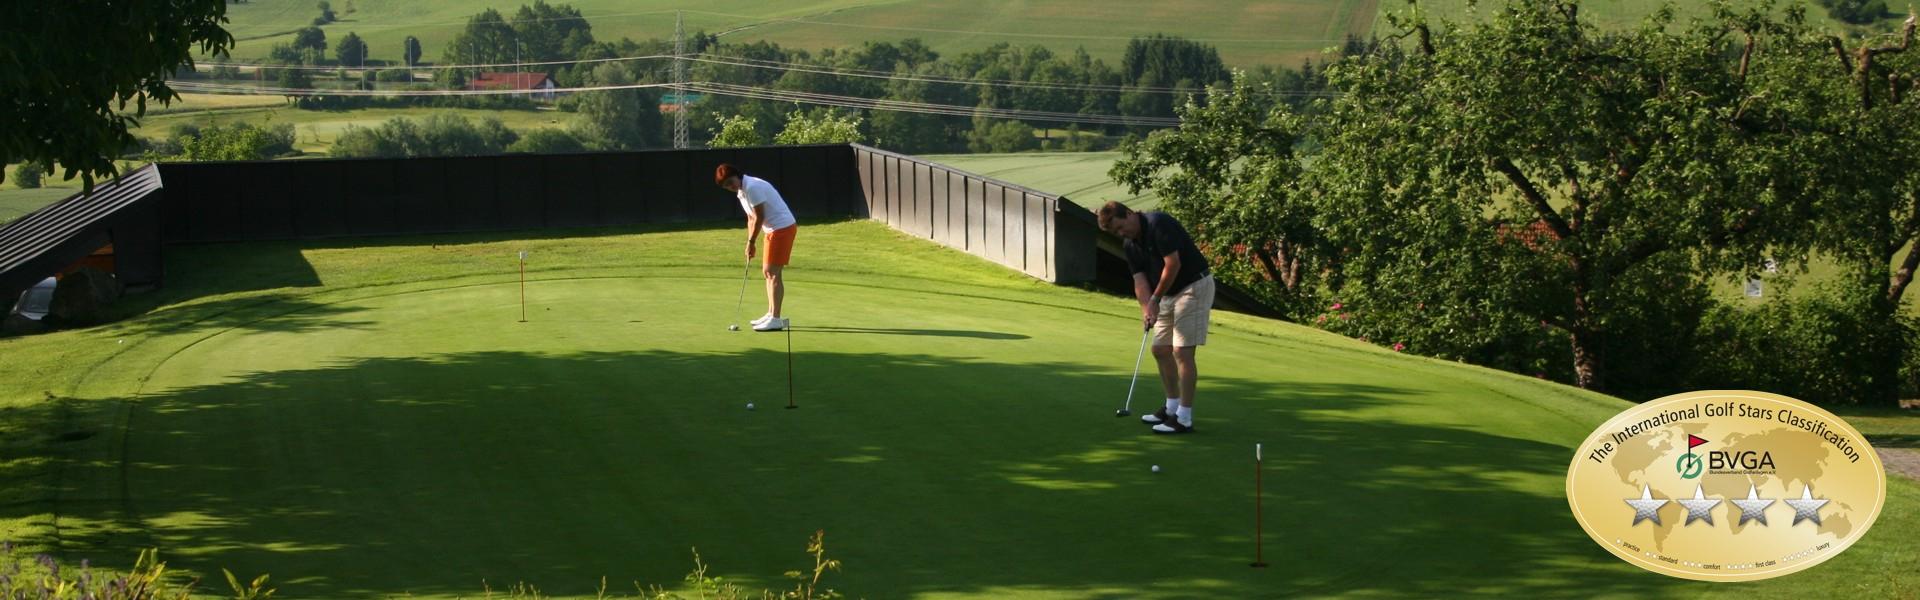 Lilli und Karl, Putting-Green im Donau Golf Club Passau-Raßbach